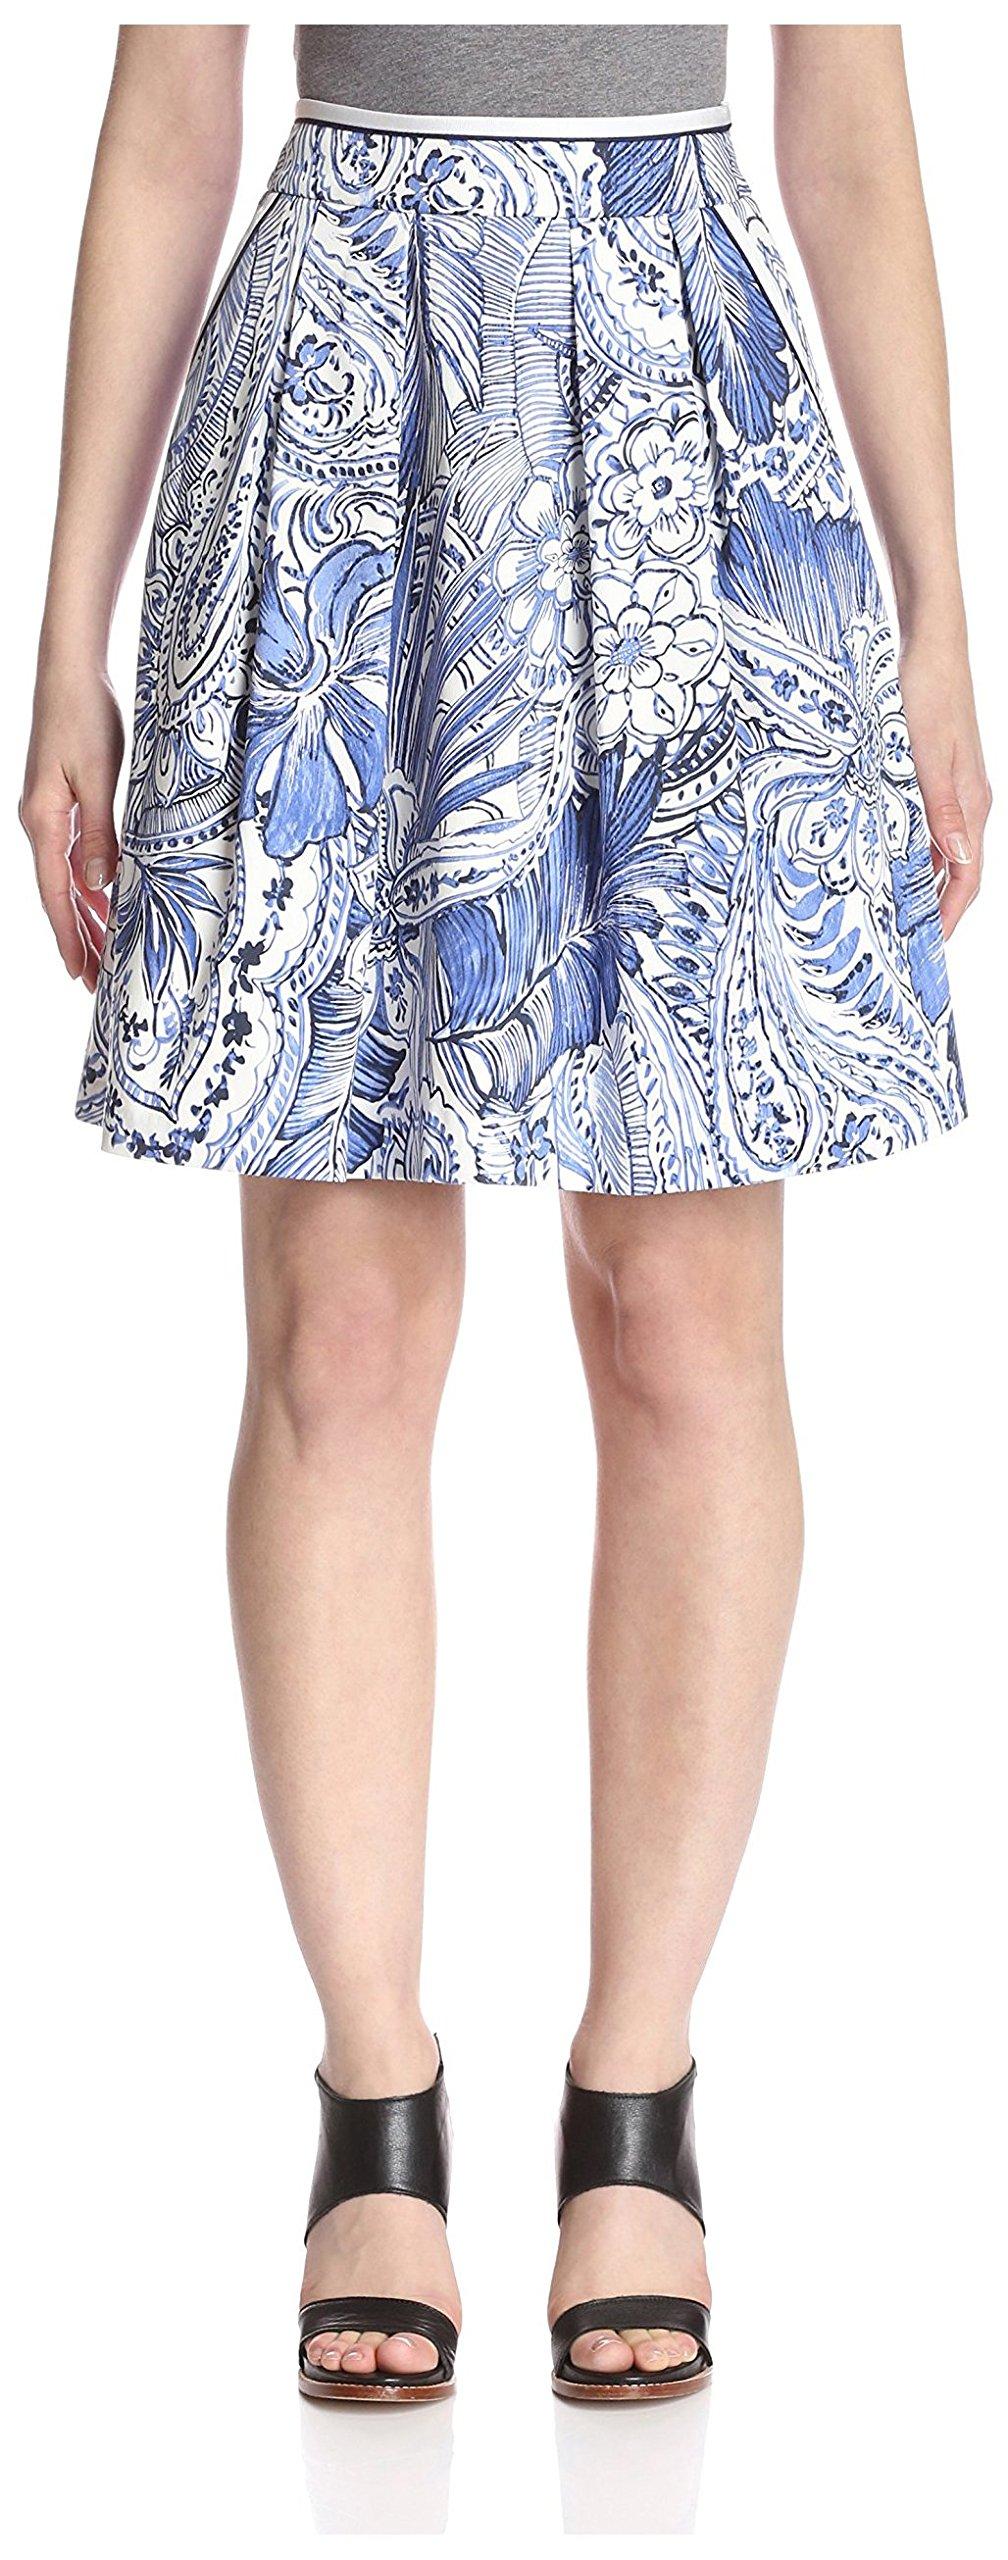 Sfizio Women's Printed Skirt, Blue/White, 8/46 US